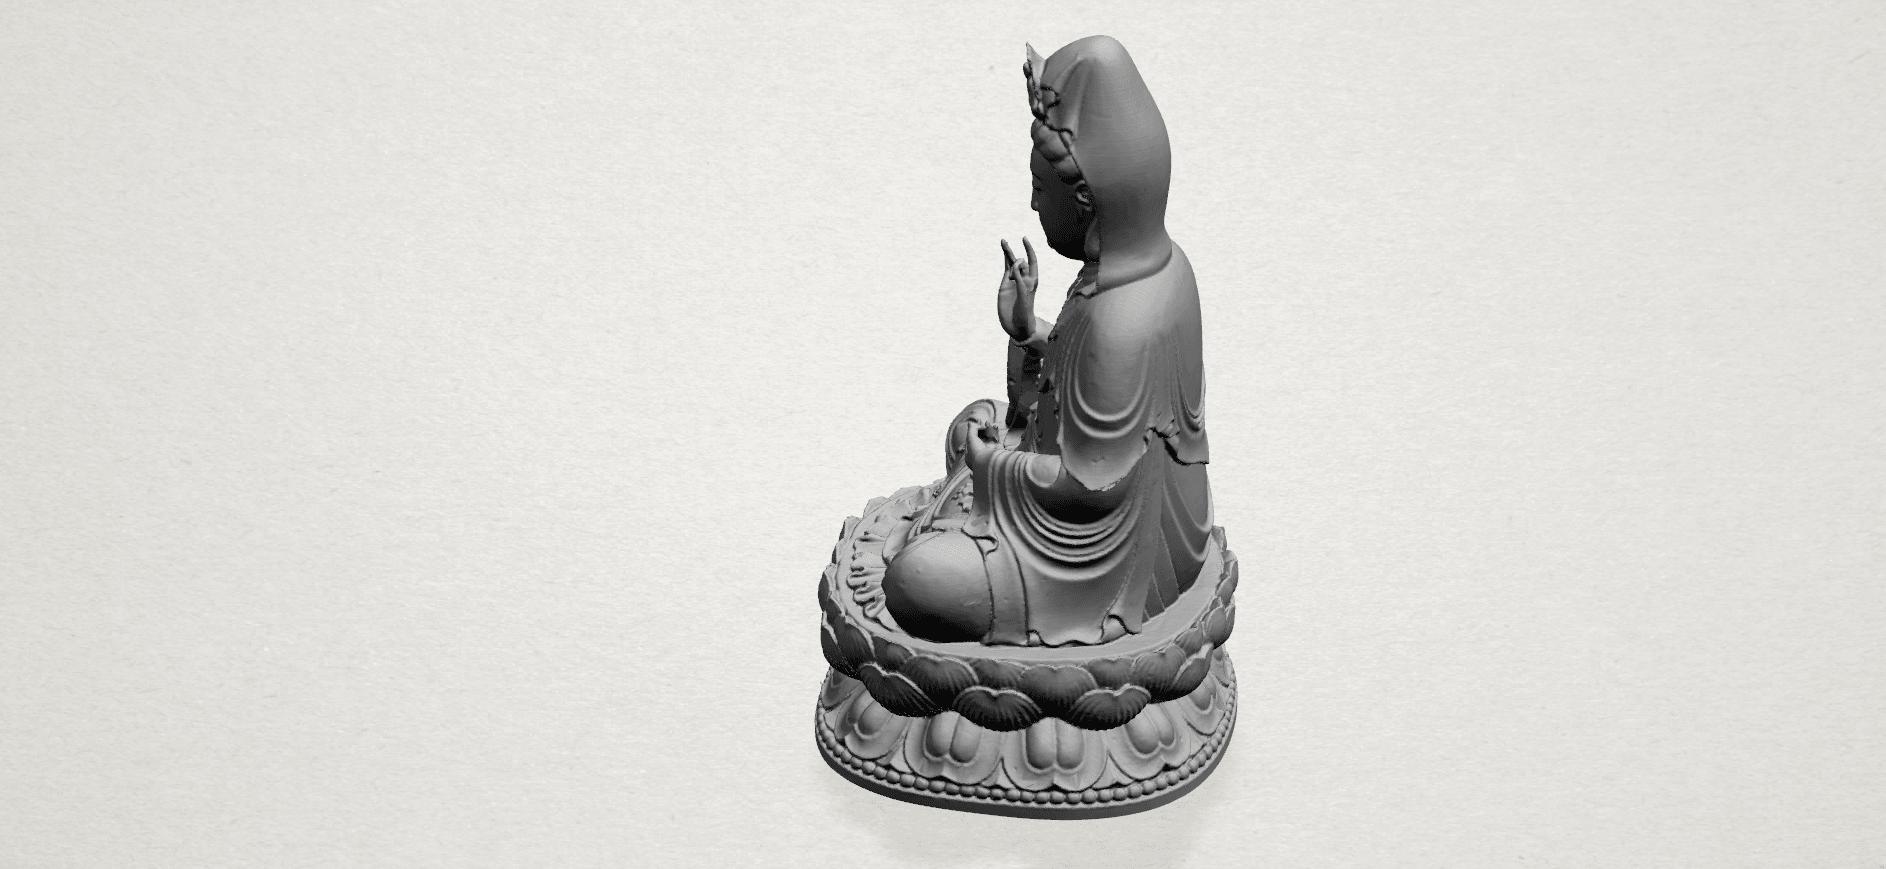 Bodhisattva Buddha - A05.png Download free STL file Avalokitesvara Bodhisattva 01 • 3D print object, GeorgesNikkei